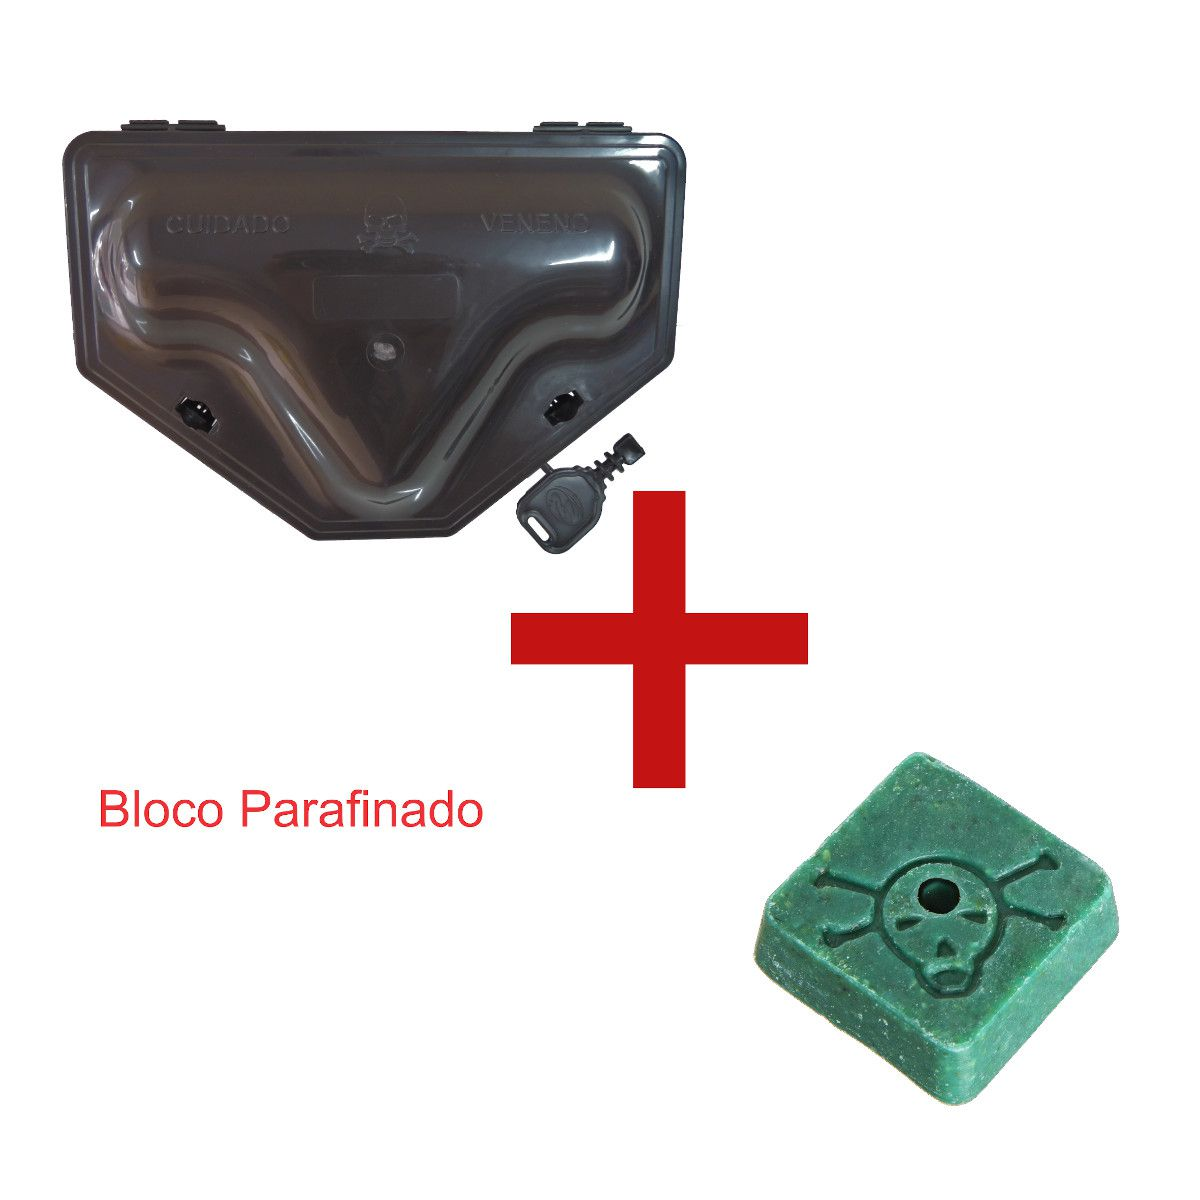 KIT 20 Porta Iscas Reforçado Ratoeira 2 TRAVAS Chave p/Ratos